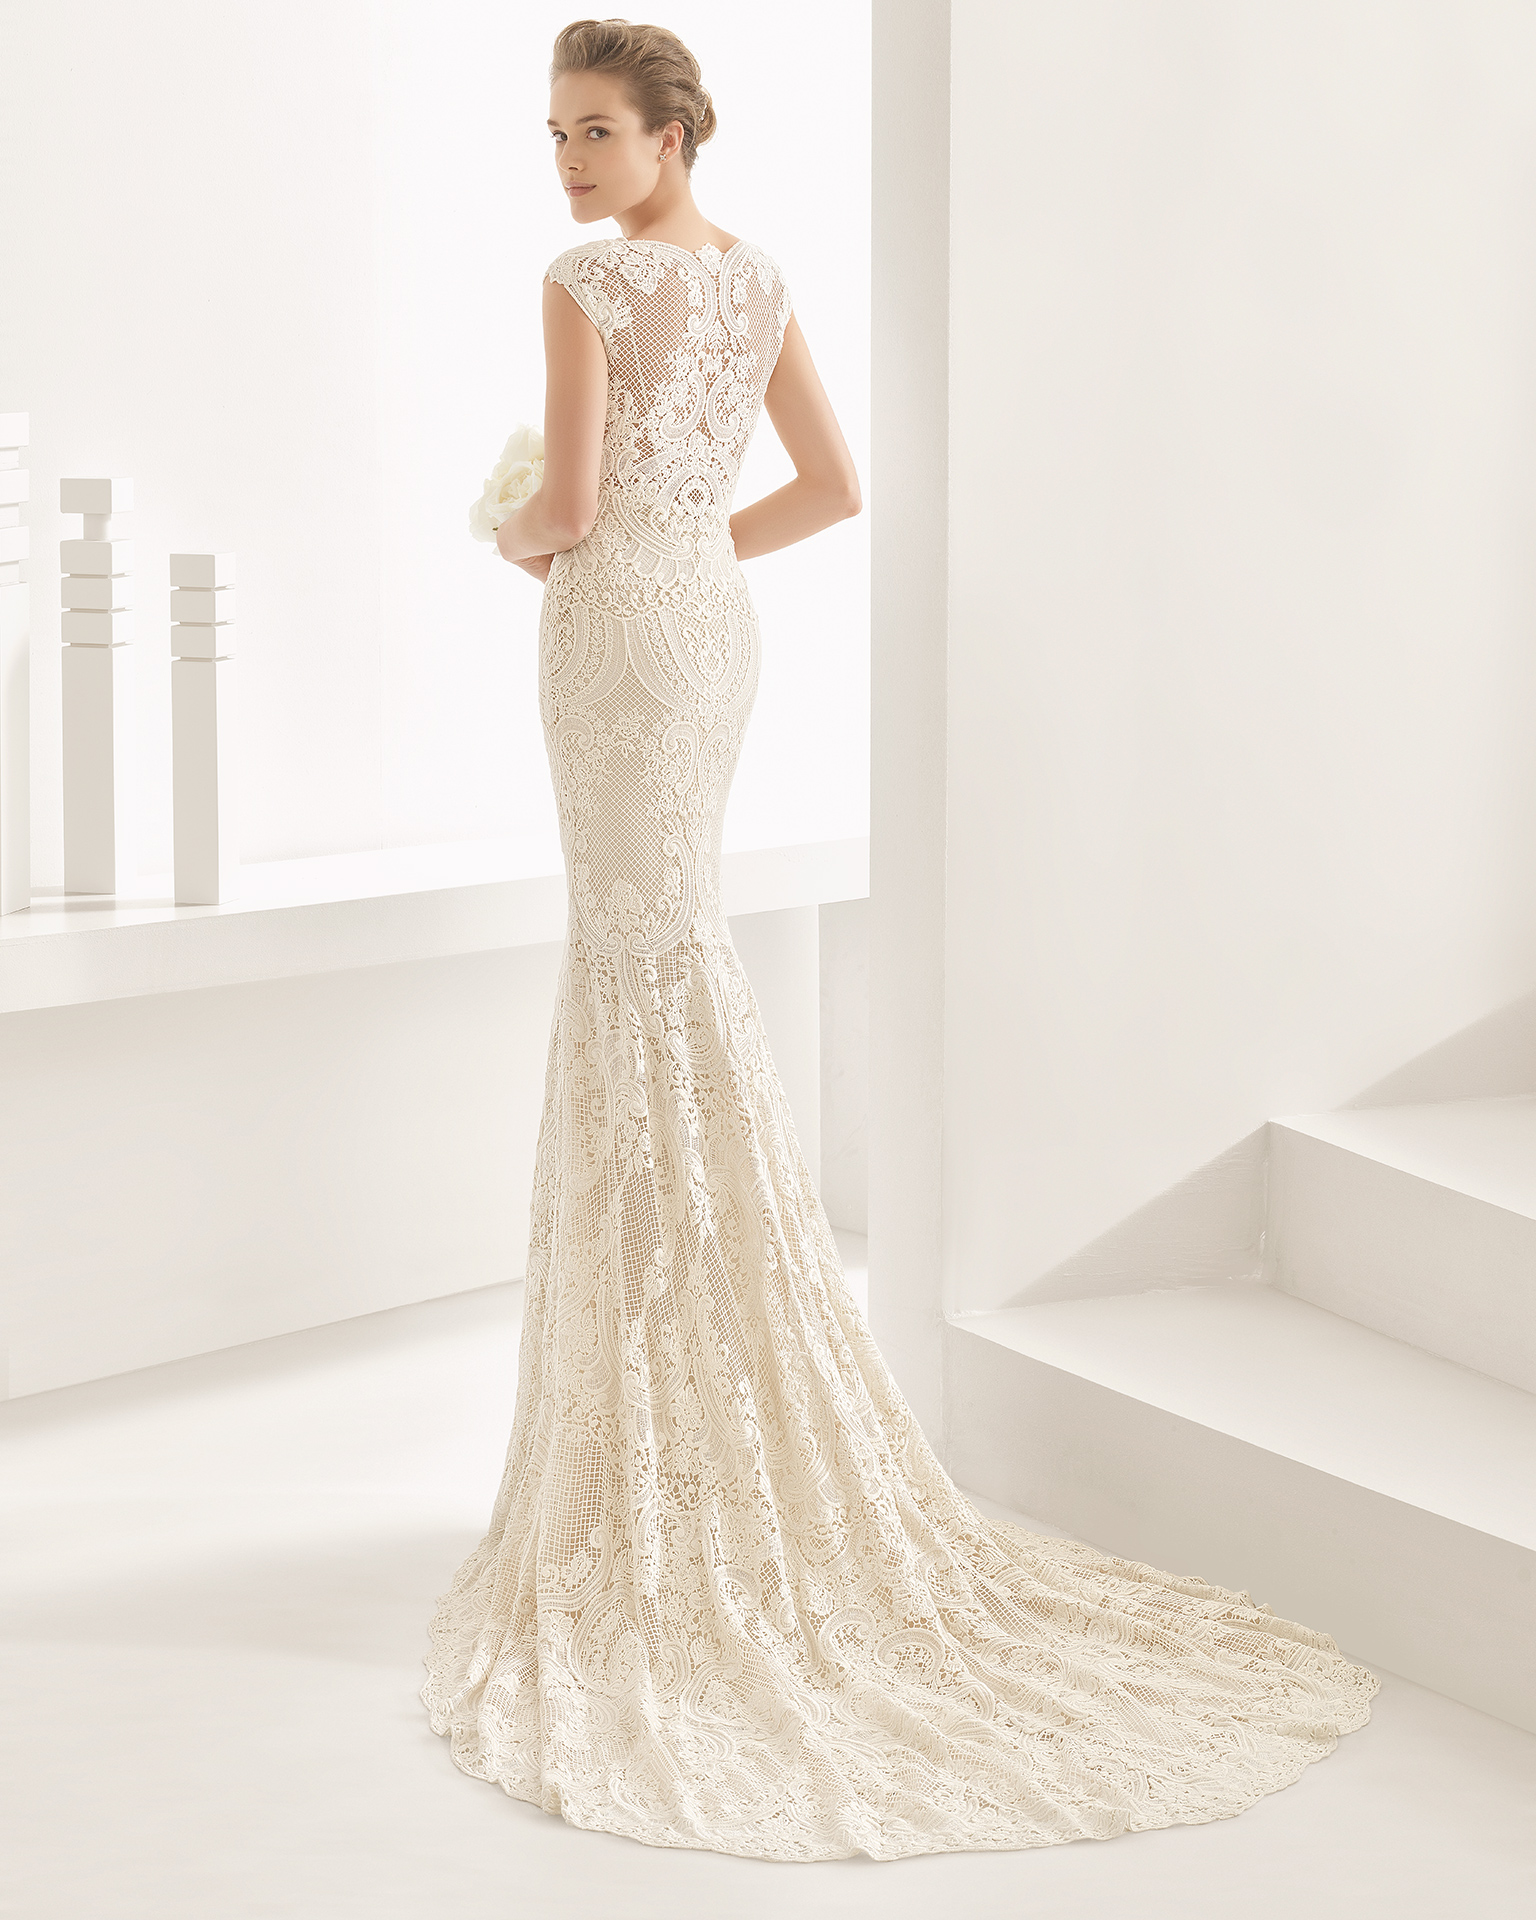 Mira Couture Rosa Clara Natalia Wedding Bridal Gown Dress Chicago Back